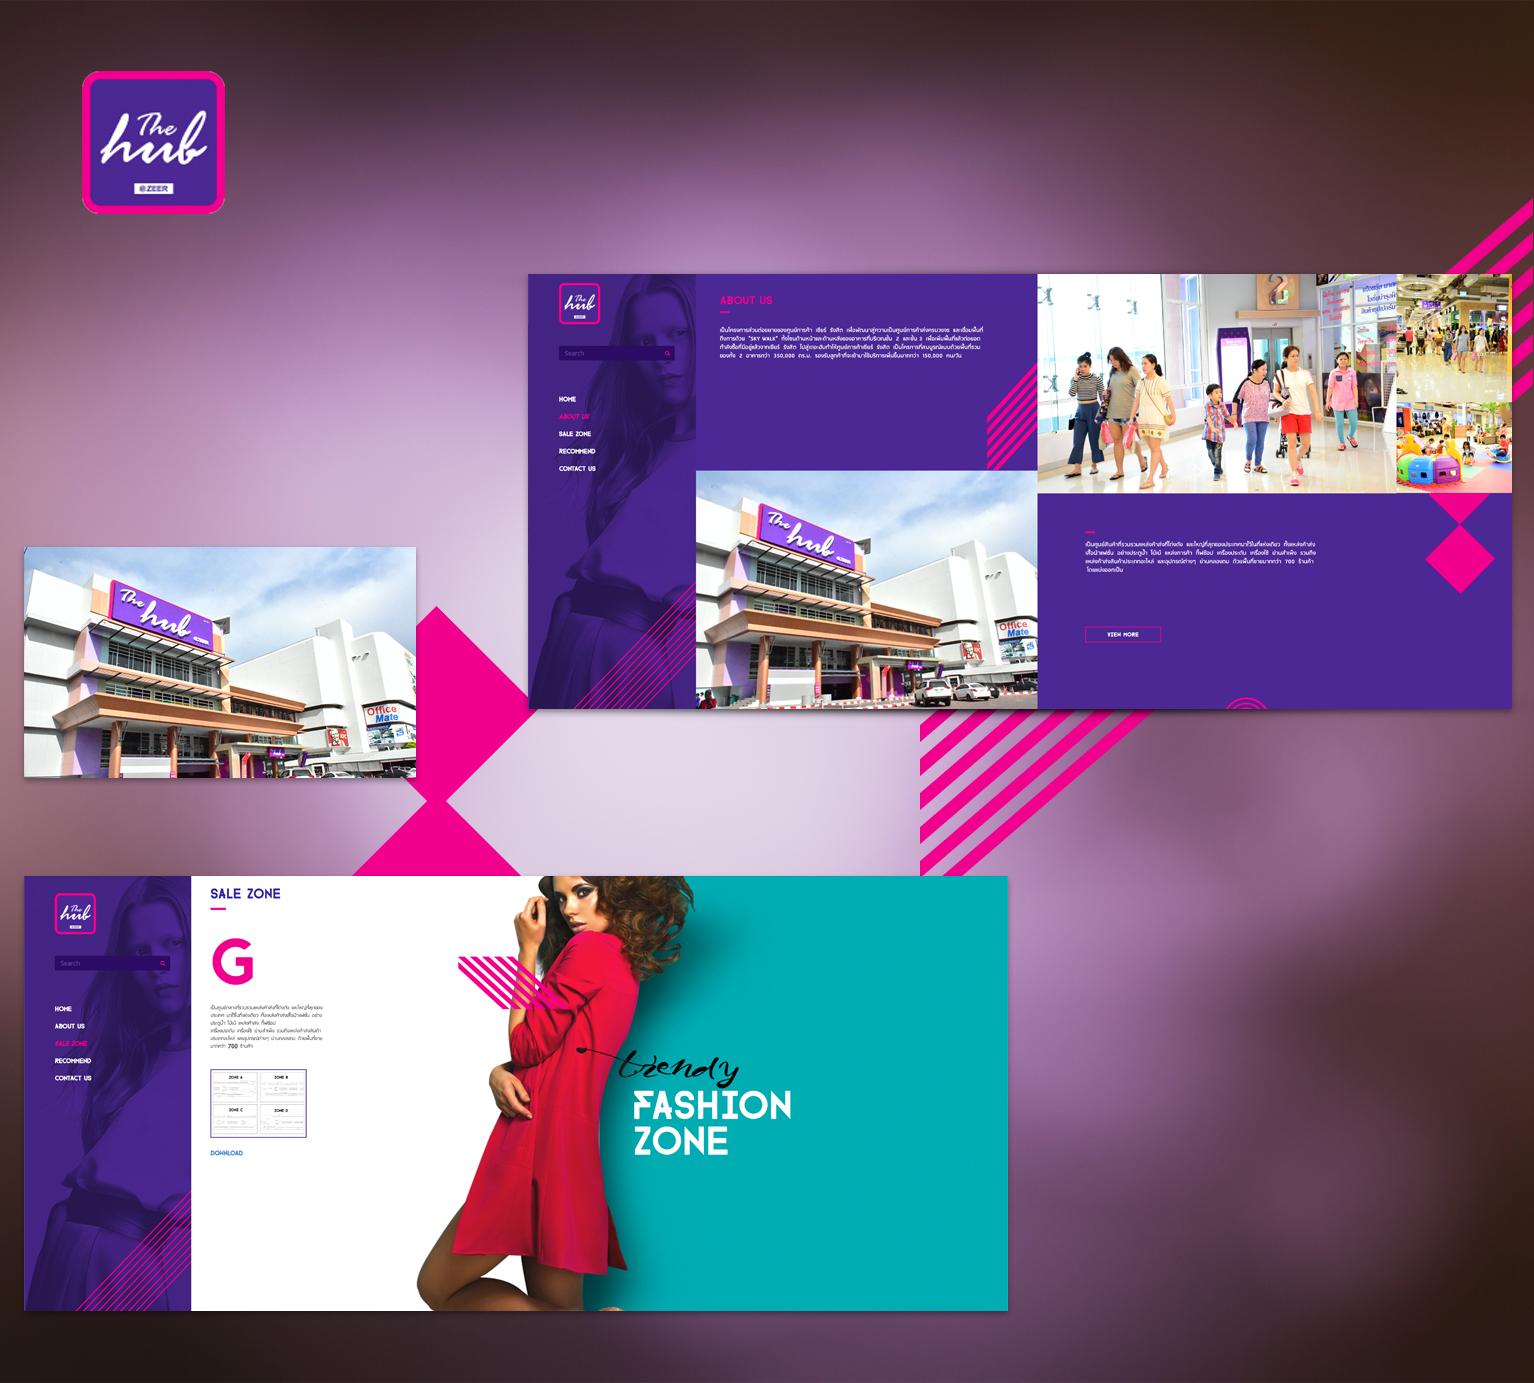 KOS Design - The HUB Rangsit